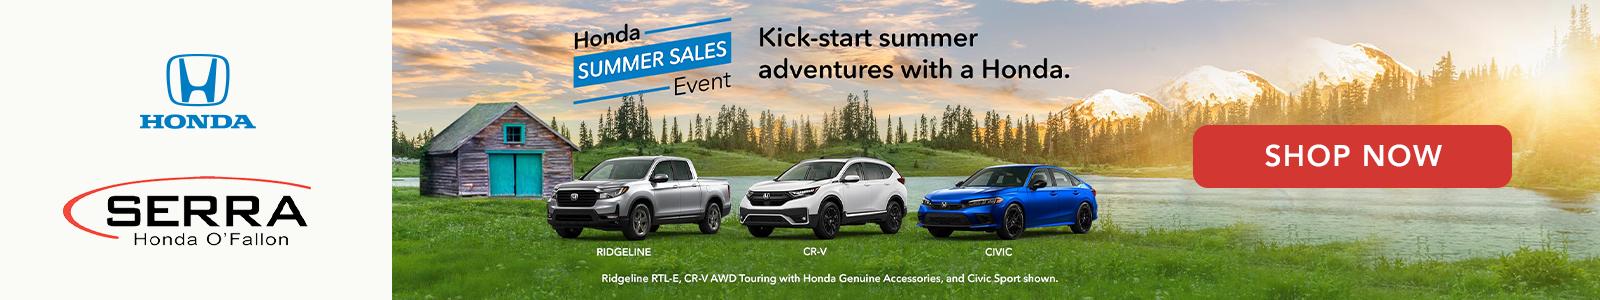 summer_sales_event